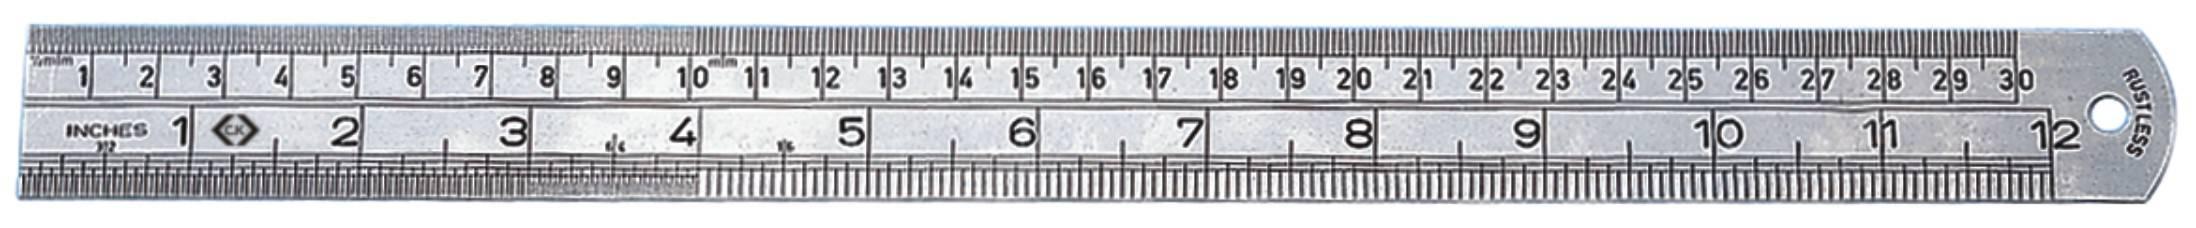 Oceľové pravítko metrické/palcové C.K. T3530 12, 300 mm